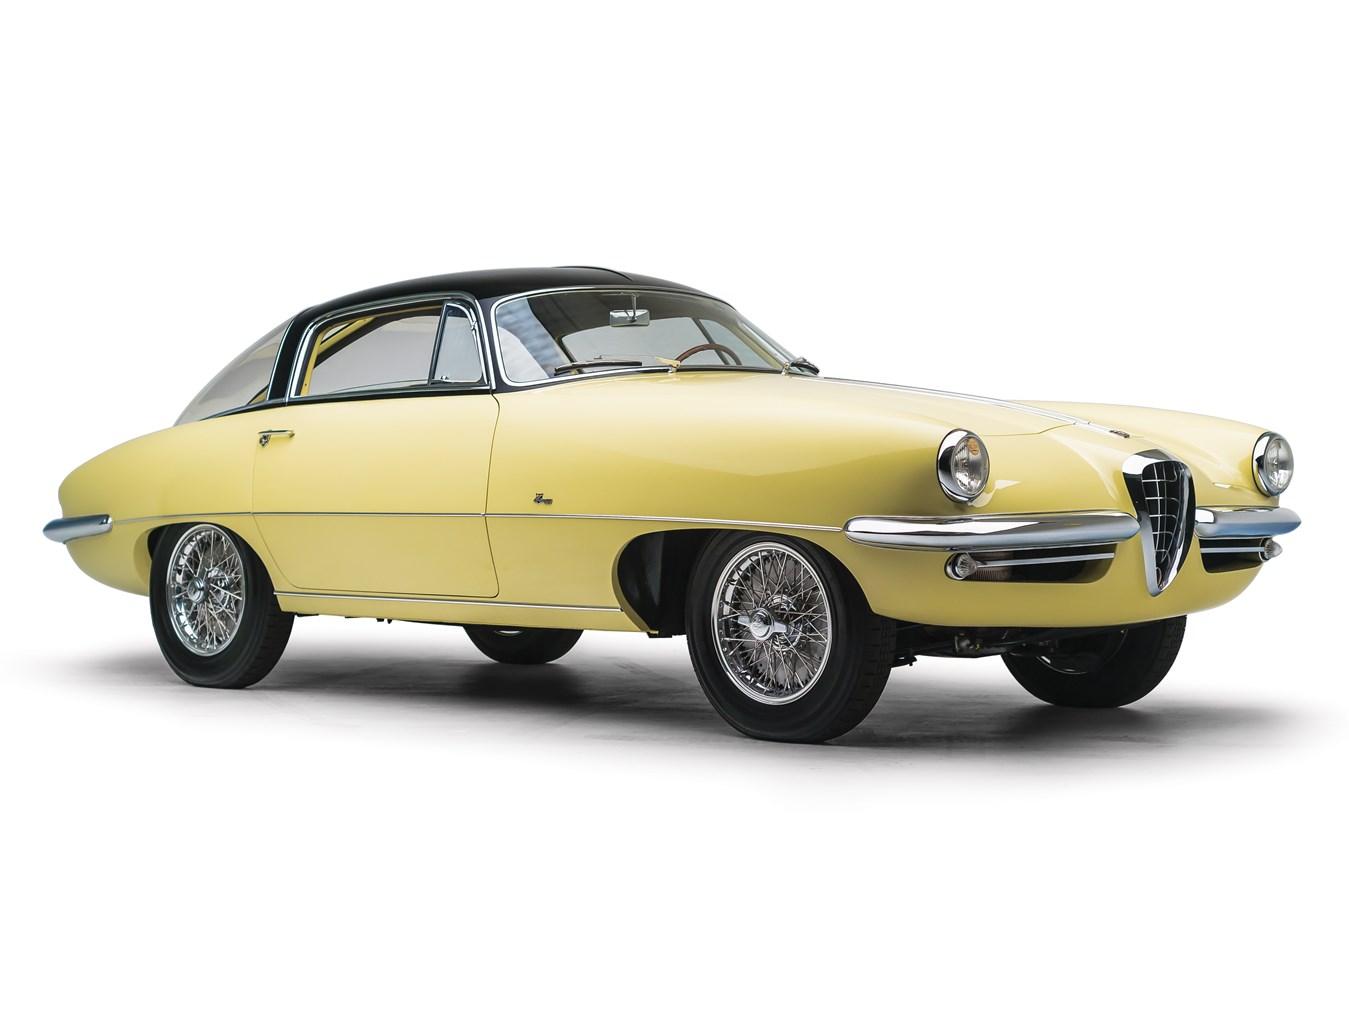 1955 Alfa Romeo 1900C SS Speciale by Boano